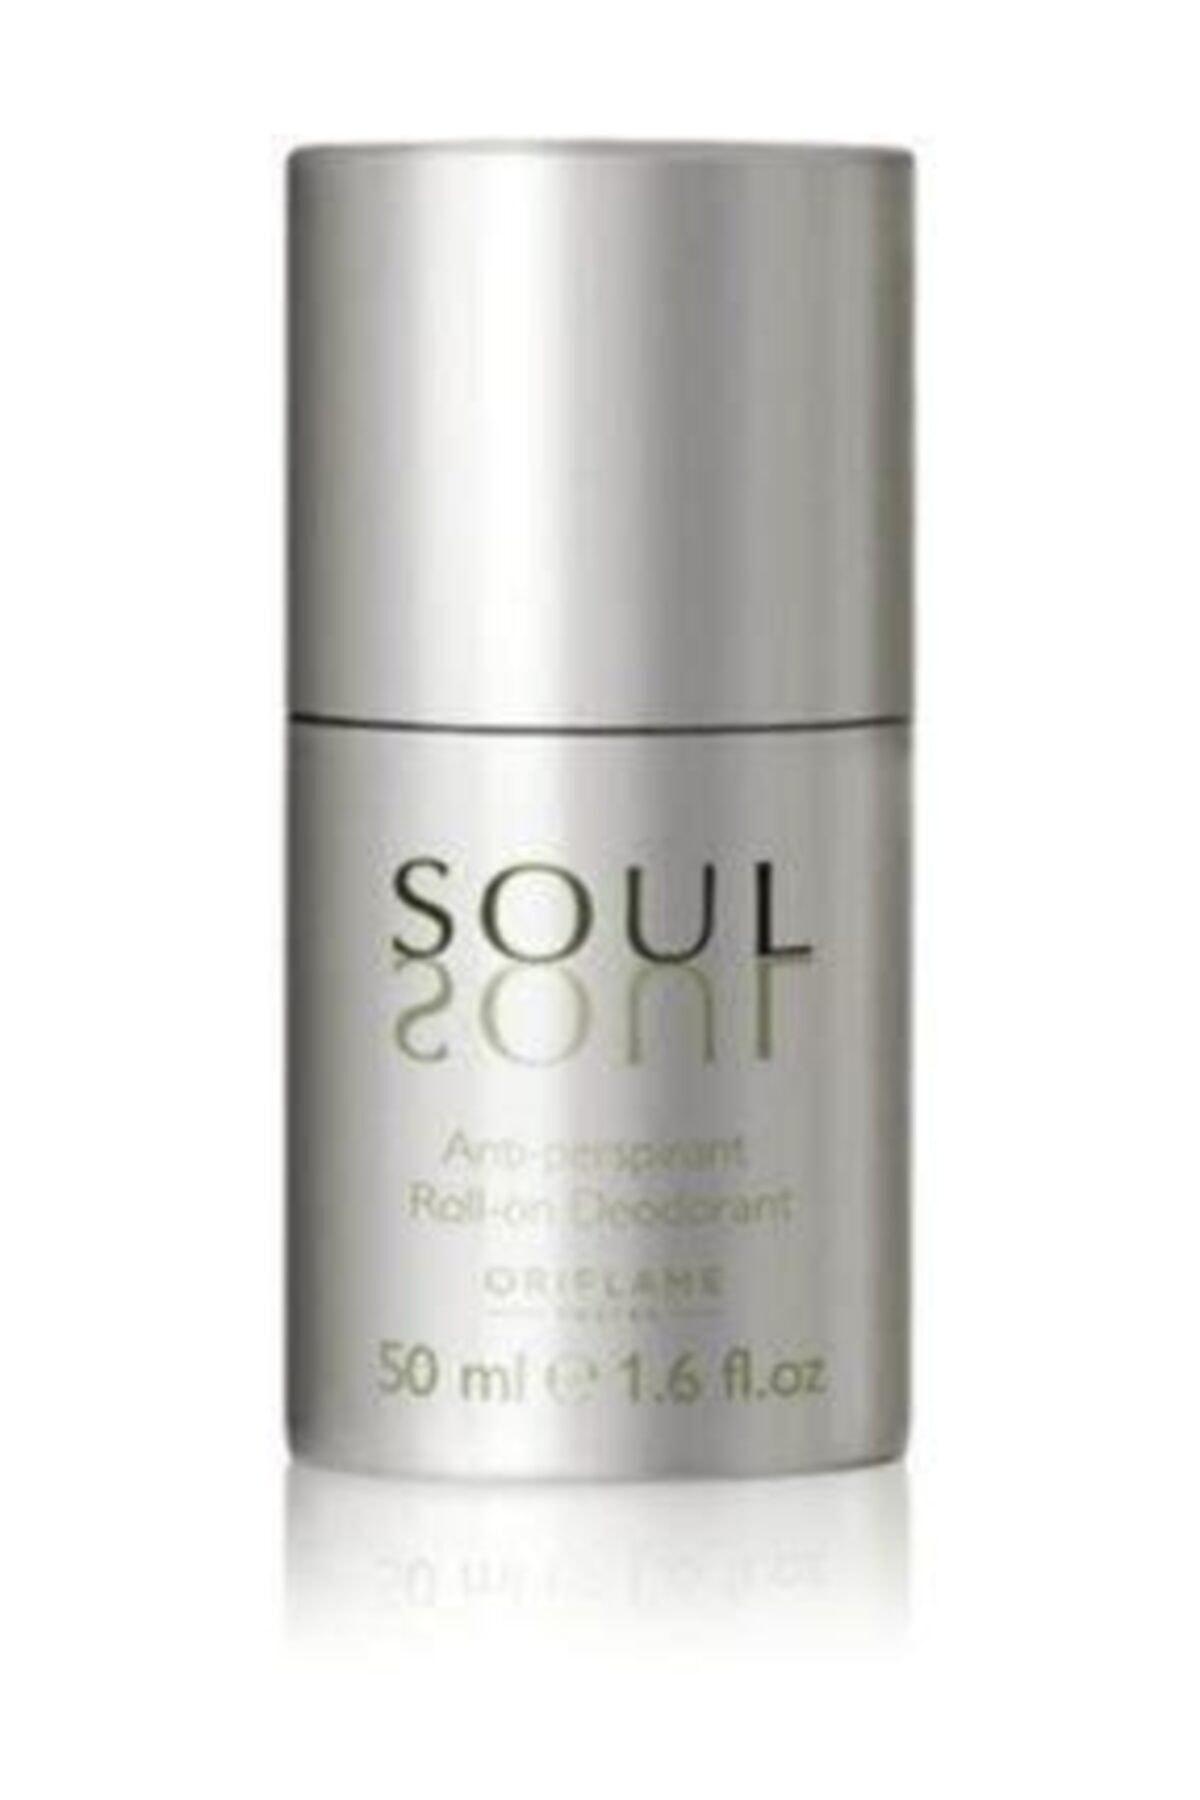 Oriflame Soul 50 ml Erkek Roll-on Deodorant 1